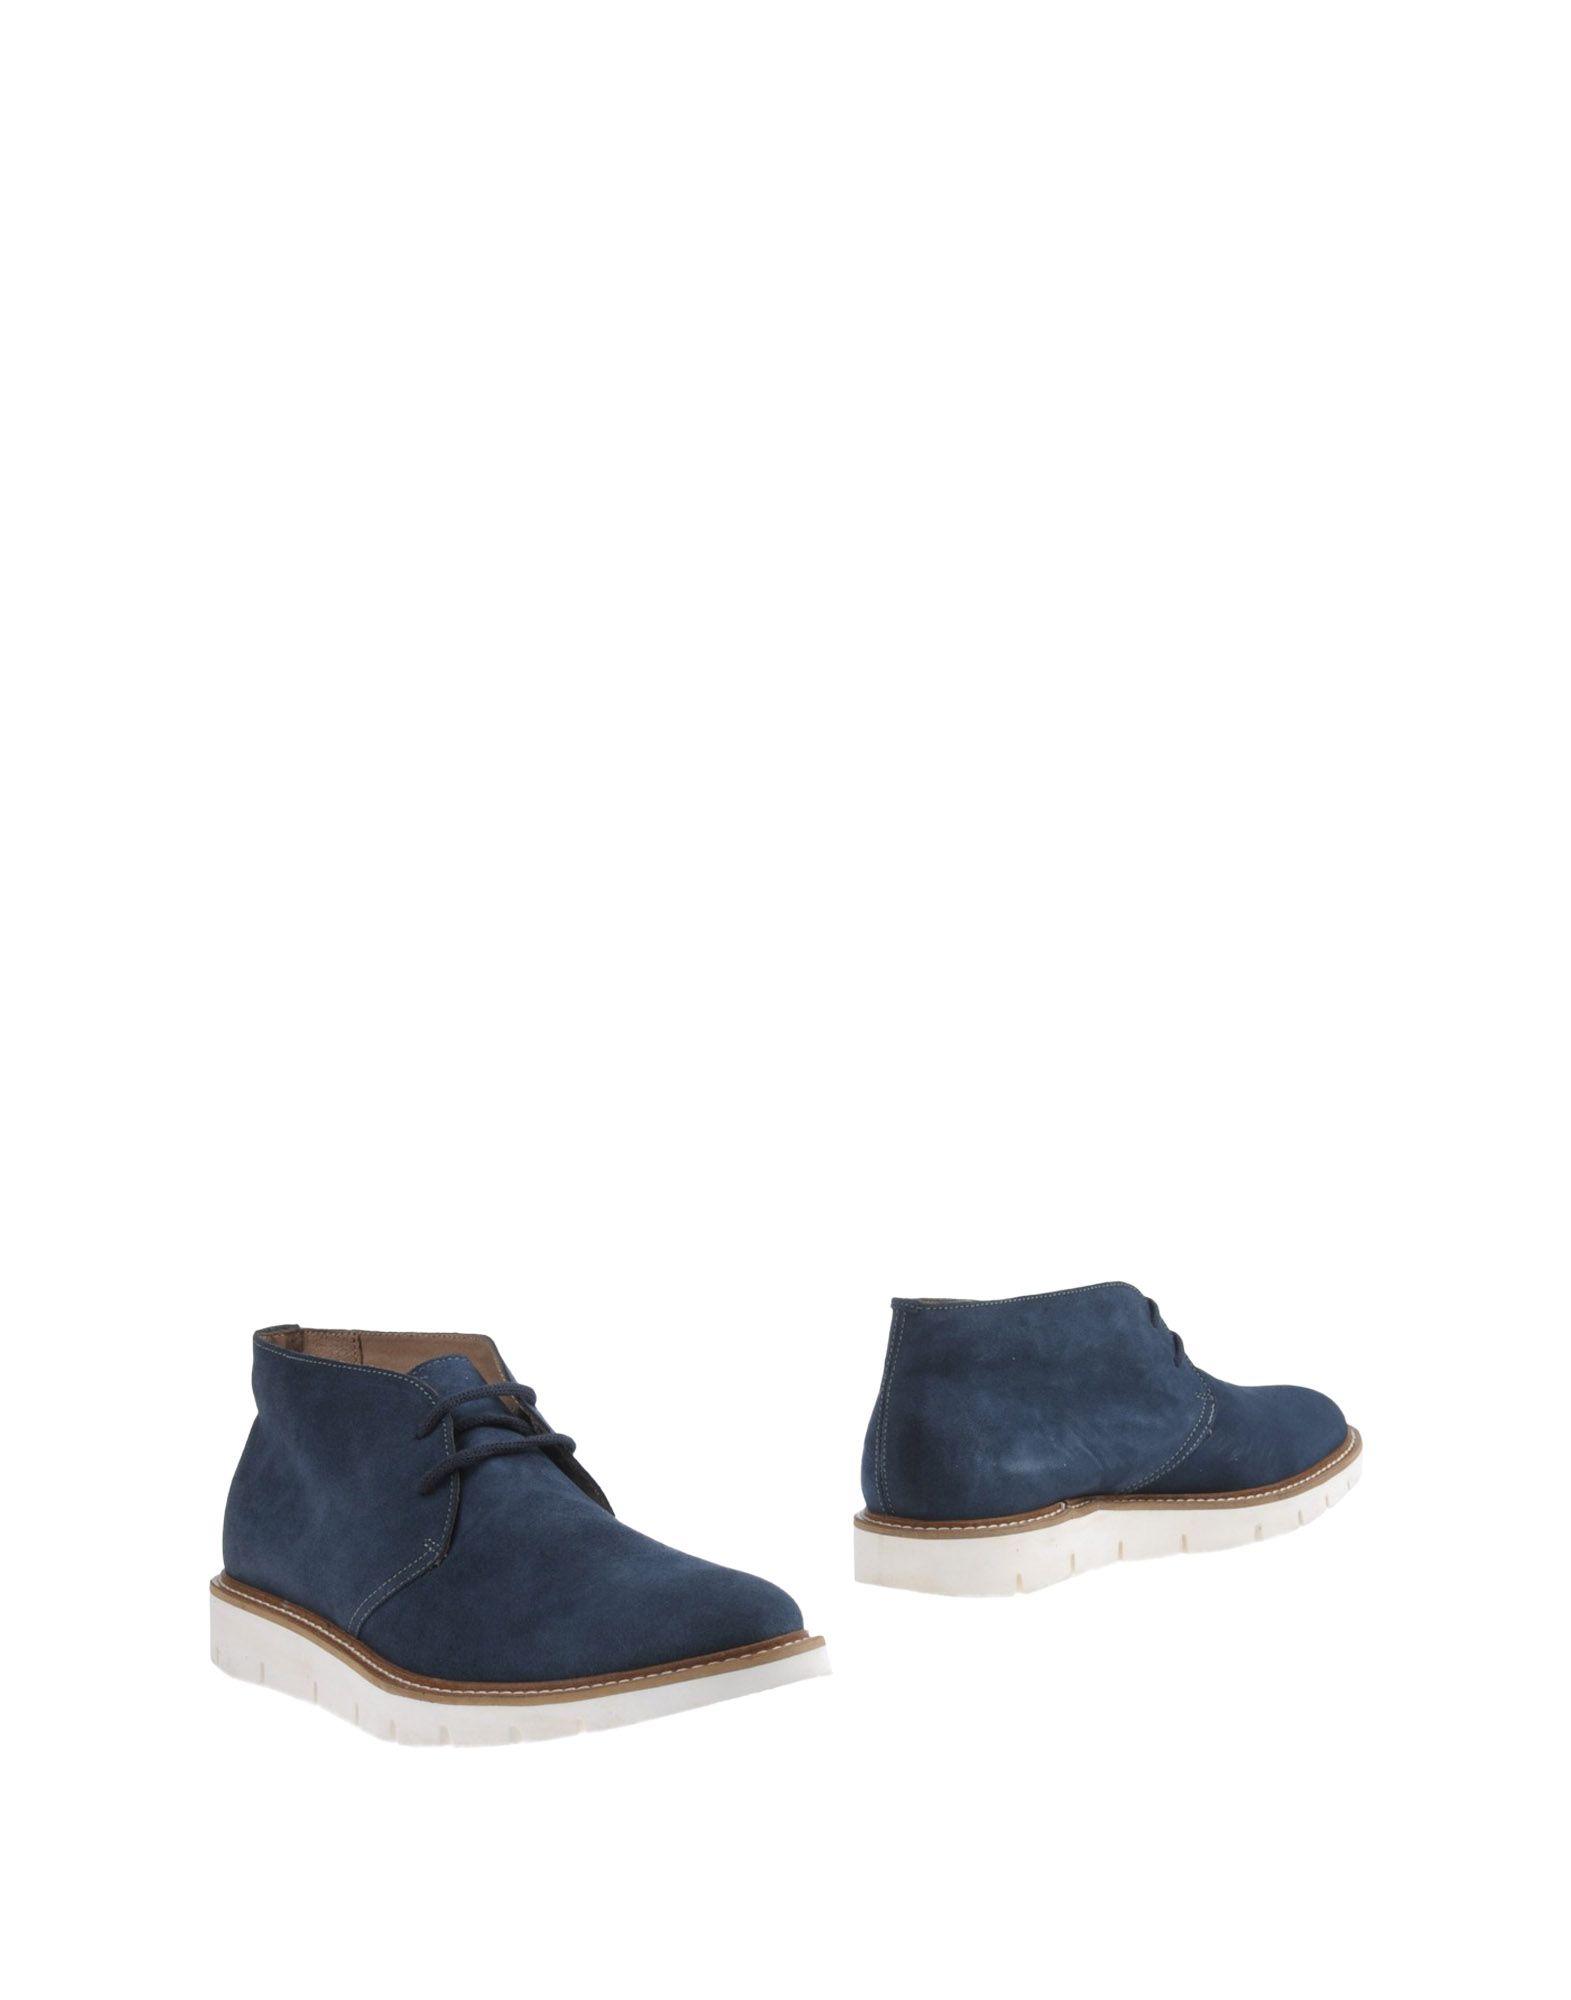 ANDERSON Полусапоги и высокие ботинки anderson высокие кеды и кроссовки